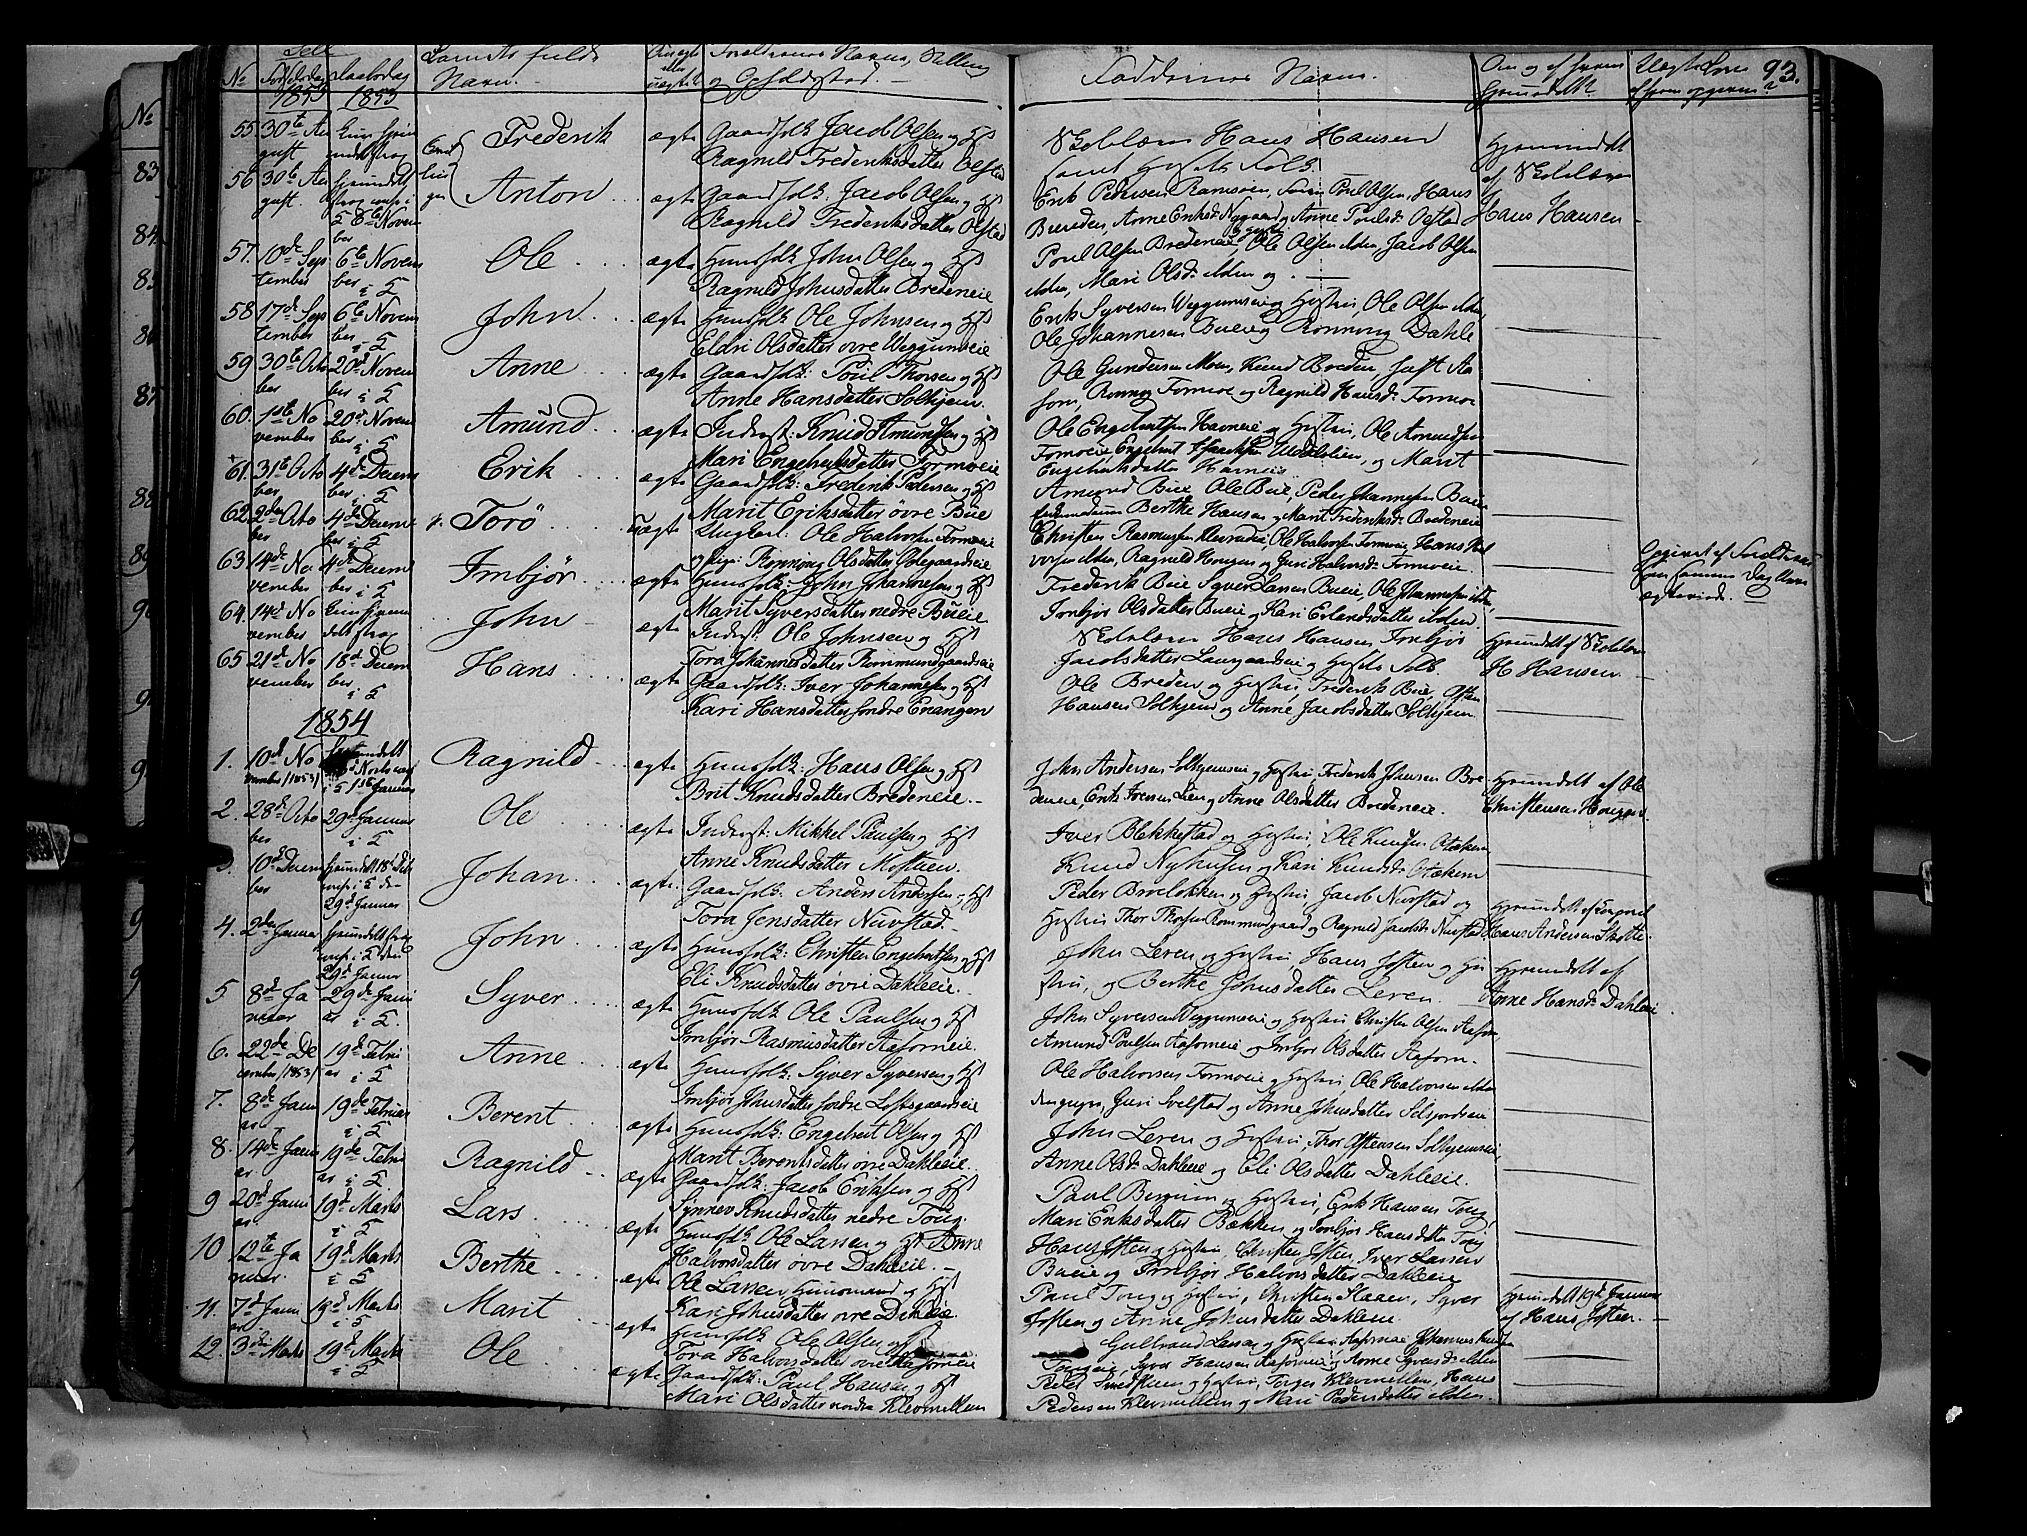 SAH, Vågå prestekontor, Ministerialbok nr. 5 /3, 1842-1856, s. 93